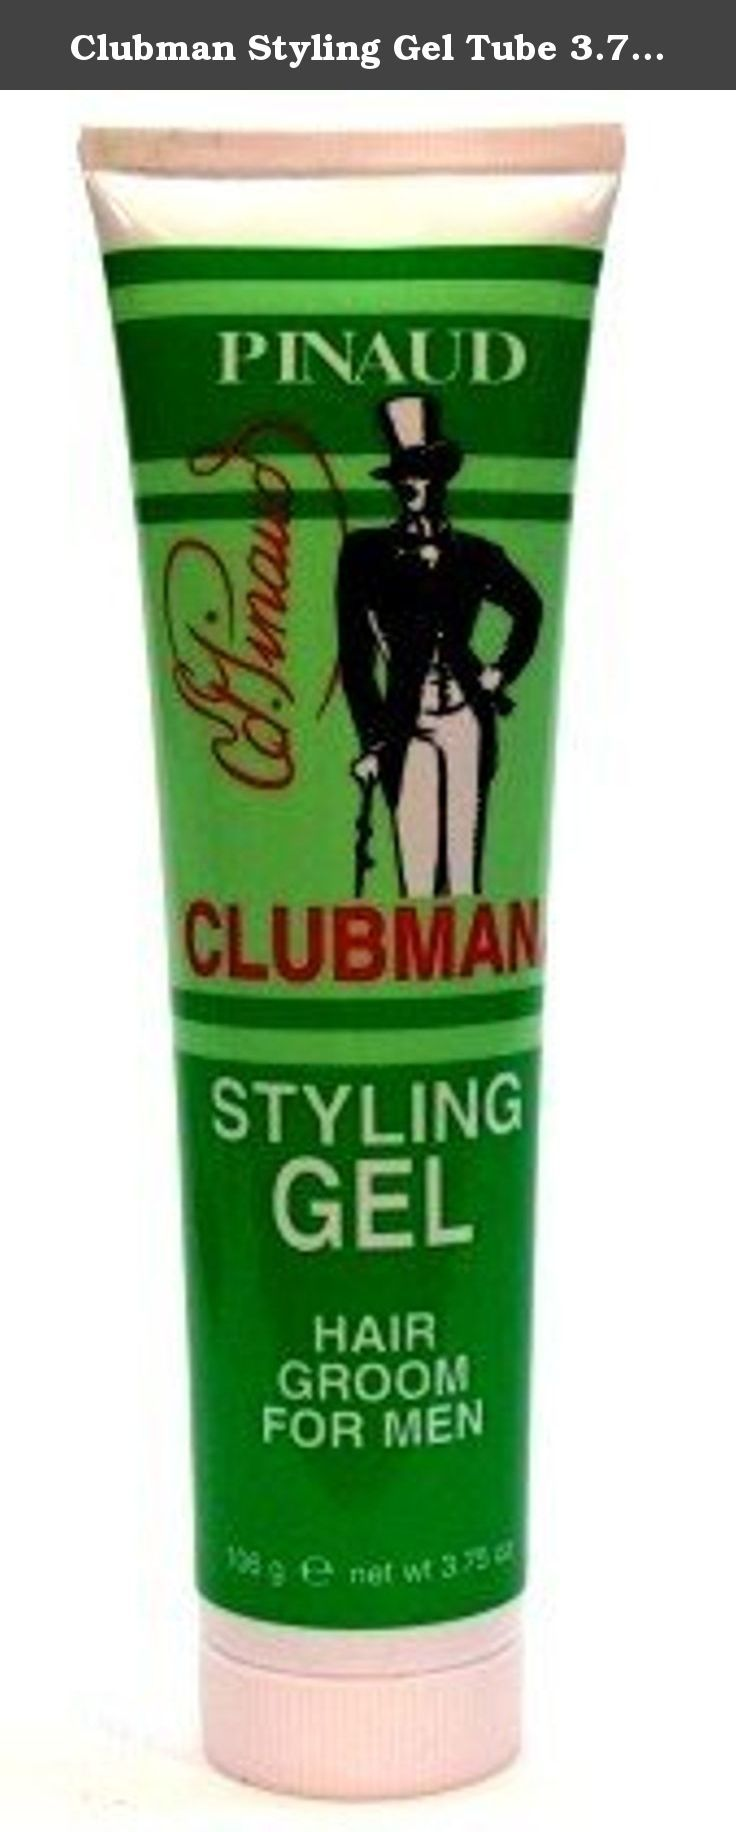 Clubman Styling Gel Tube 3.75 oz. (Case of 6). CLUBMAN'S